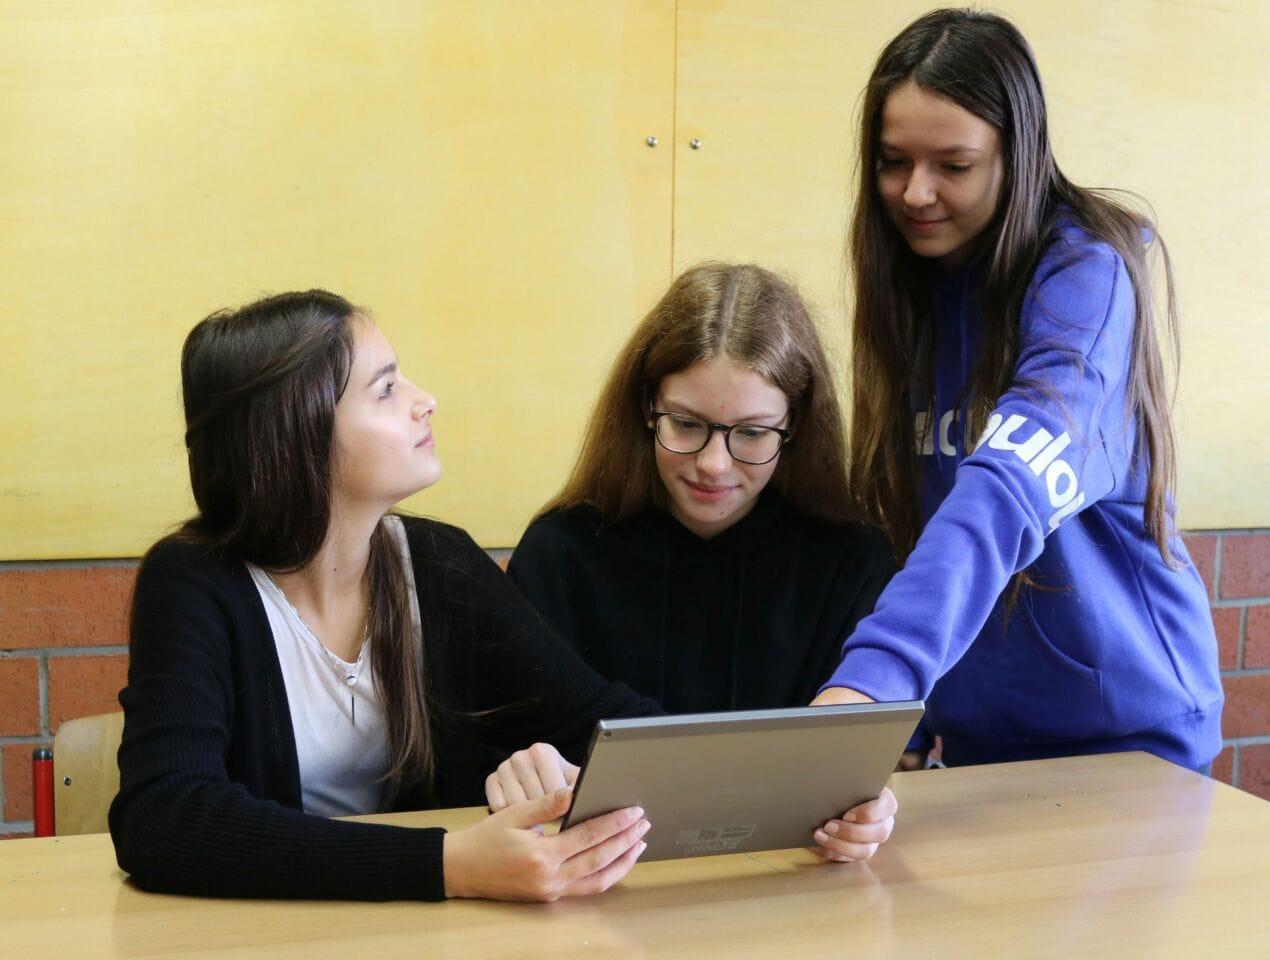 Leo-Weismantel-Realschule: Anmeldung ab 10. Mai